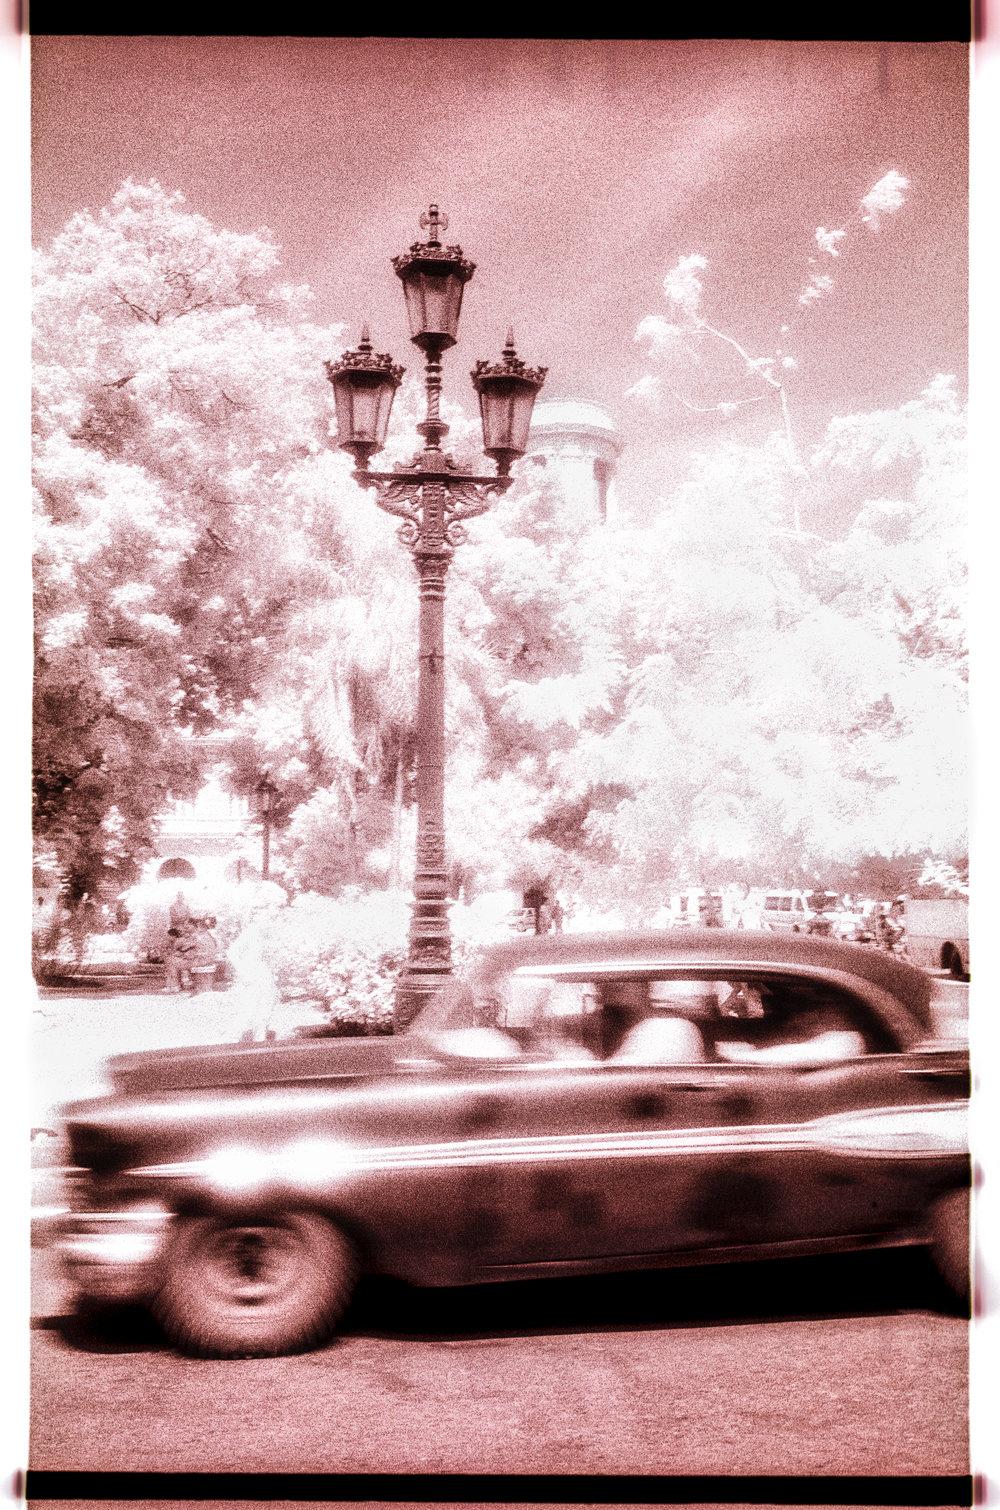 Siesta_Cuba-06.jpg